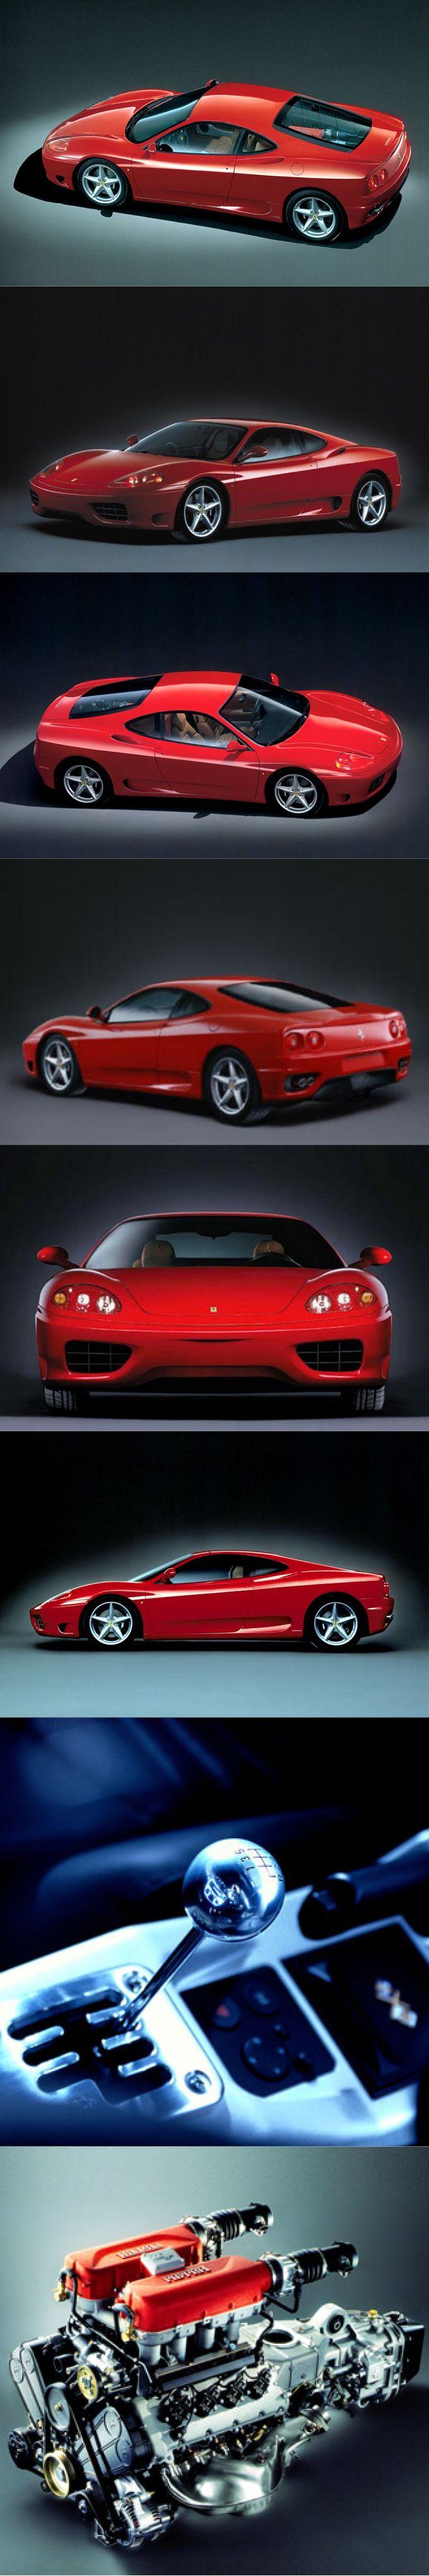 1999 Ferrari 360 Modena / 395hp 3.6l V8 / Italy / red